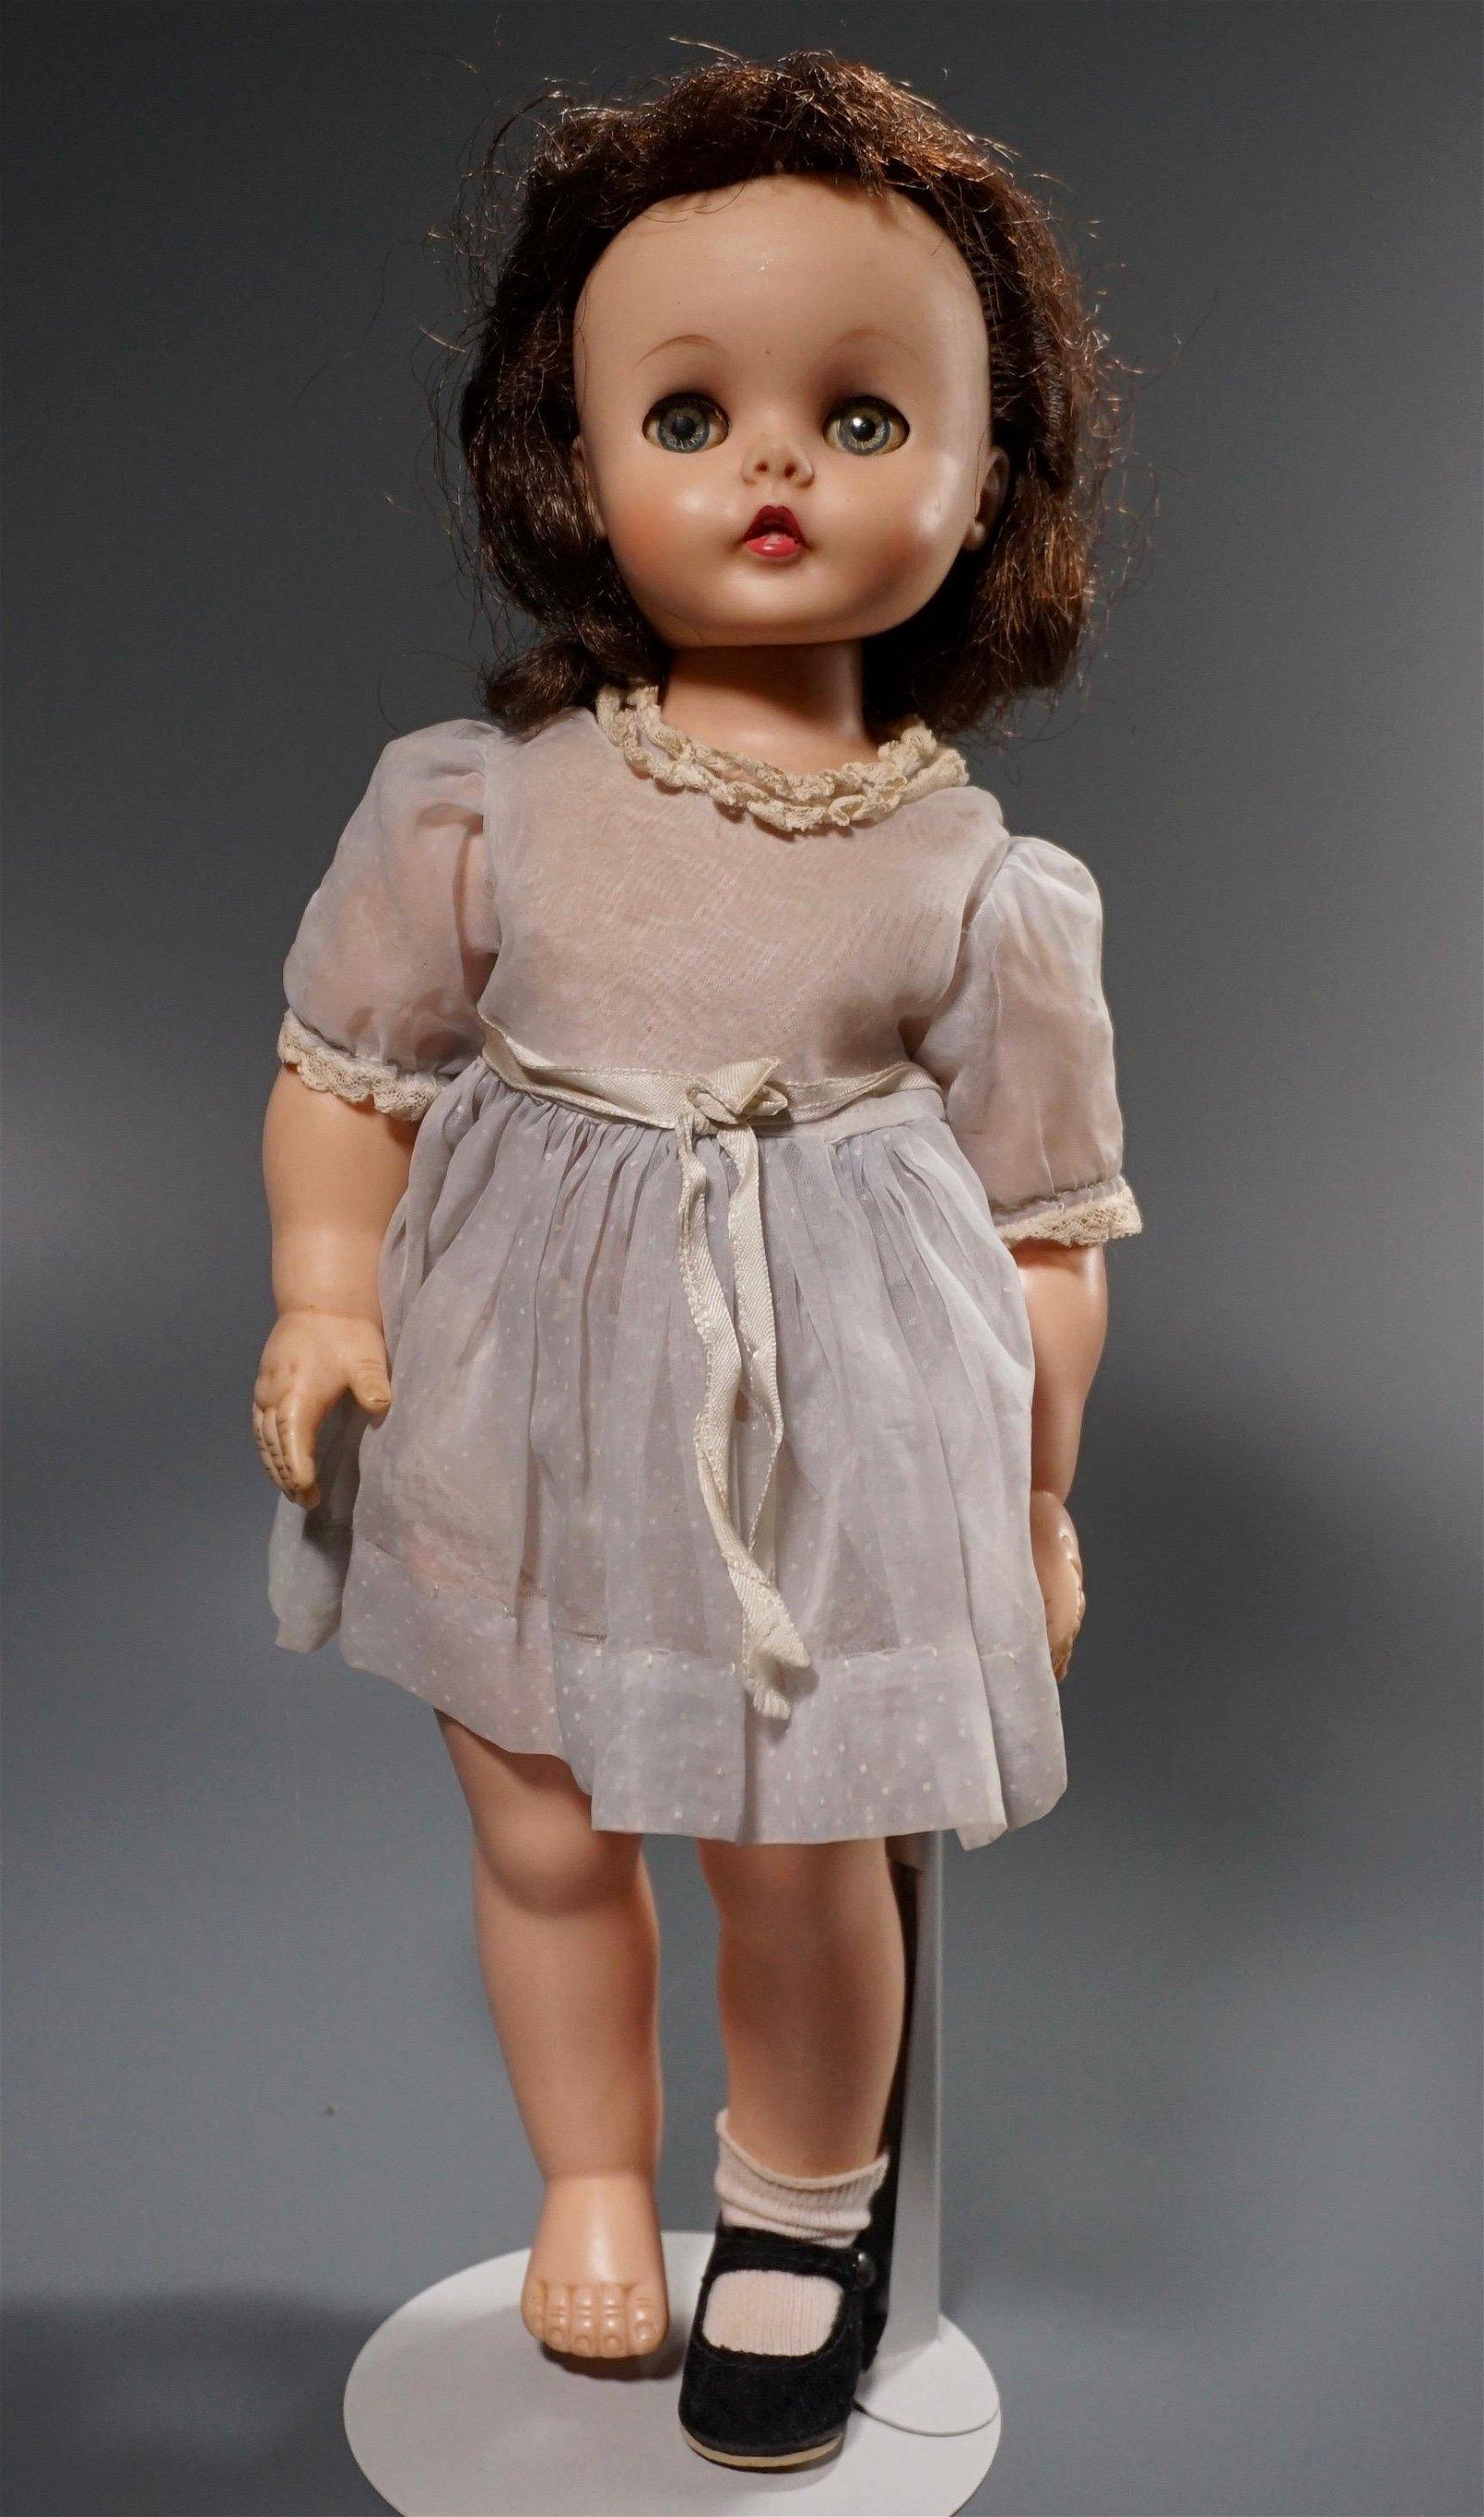 Vintage Alexander Kelly Doll Original Dress on Display